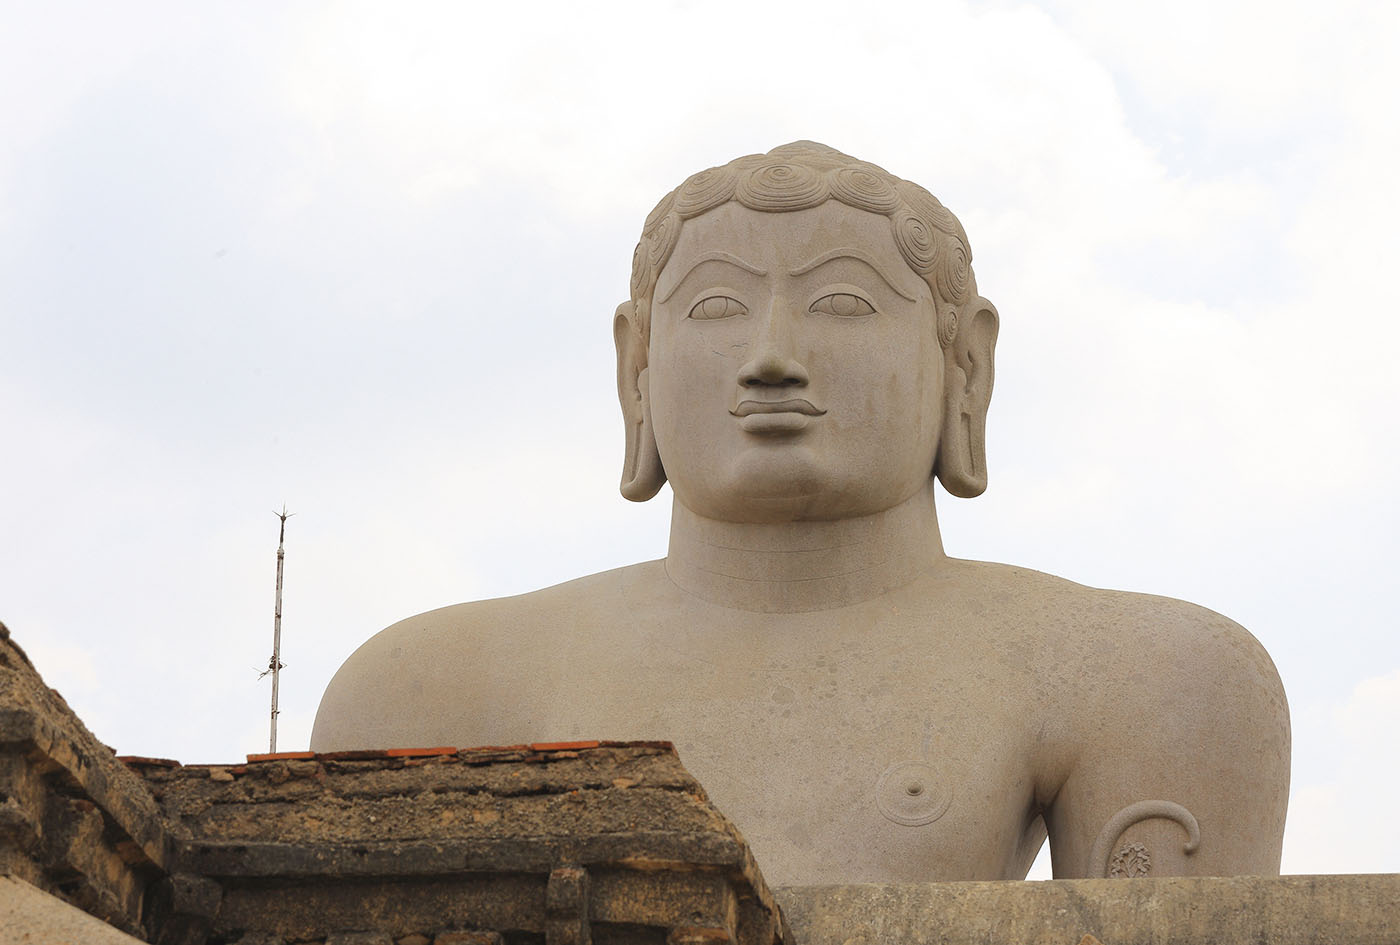 Фото 13. Тур по Индии. Бахубали. Голова. 125, 14.0, 100, 127